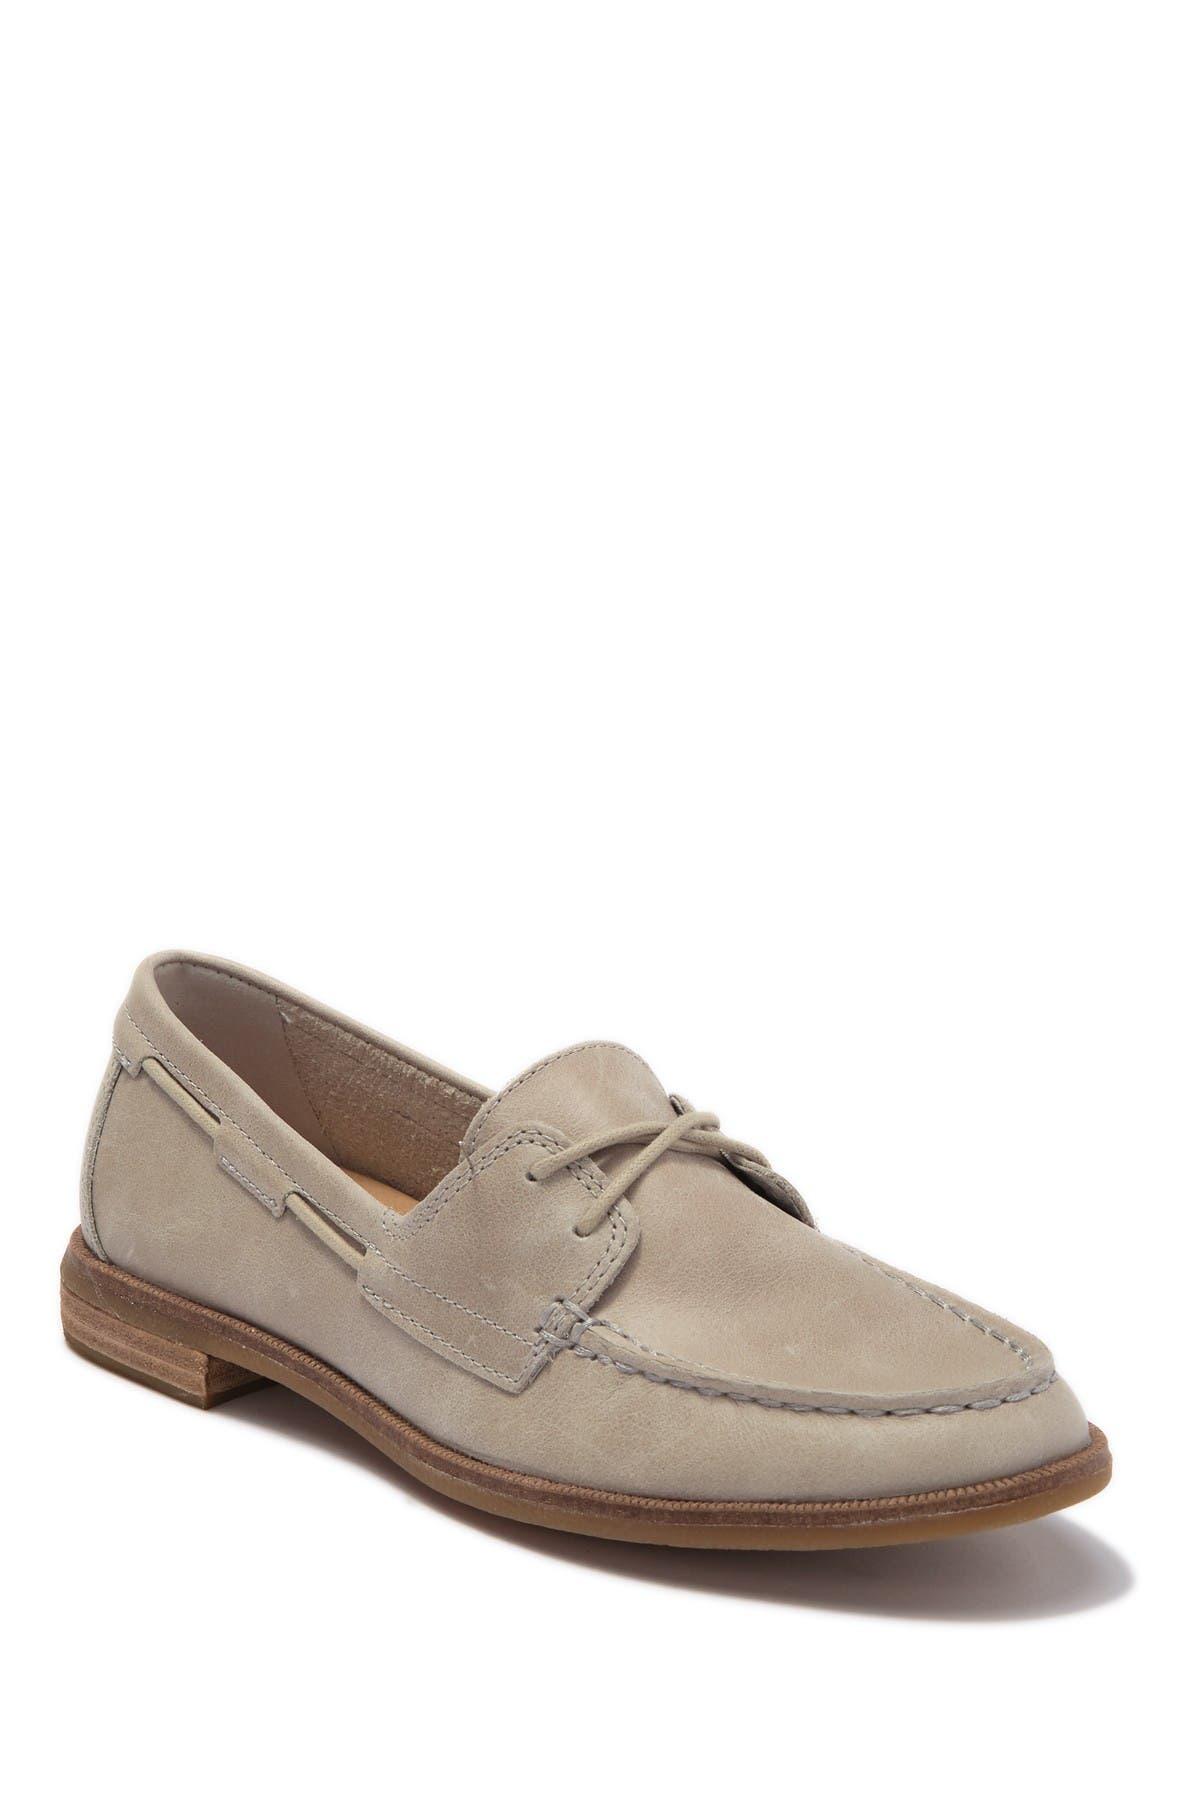 Sperry | Seaport Boat Shoe | Nordstrom Rack